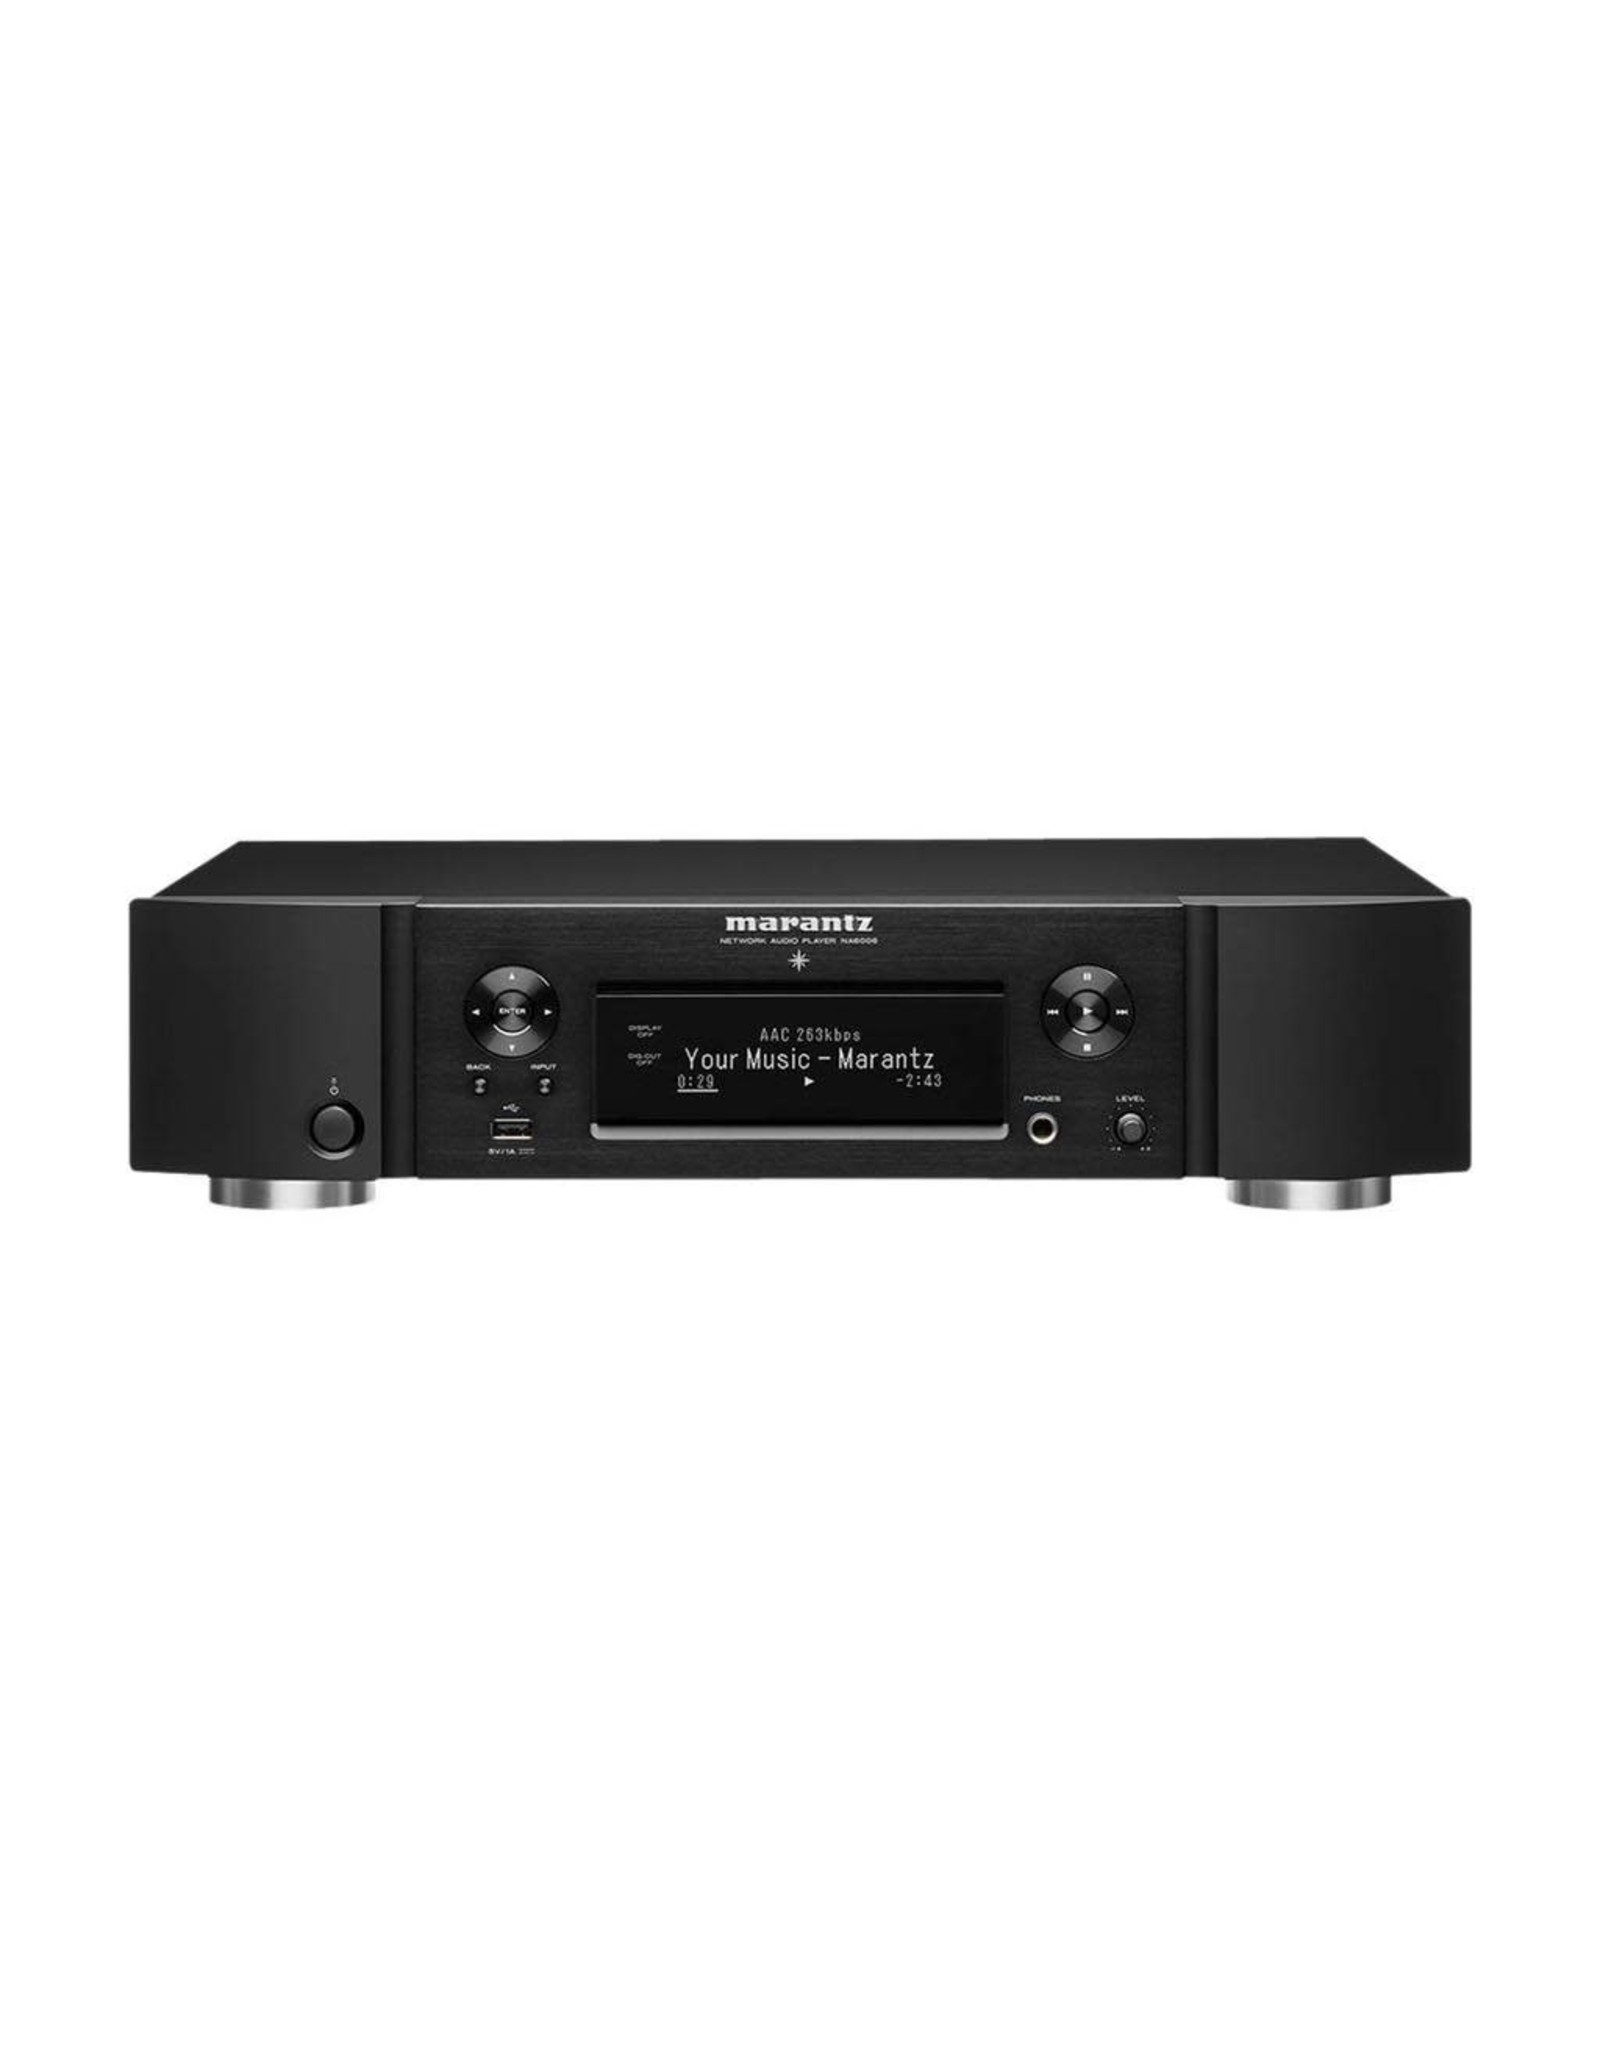 MARANTZ MARANTZ NA6006 Network Audio Player w/Heos